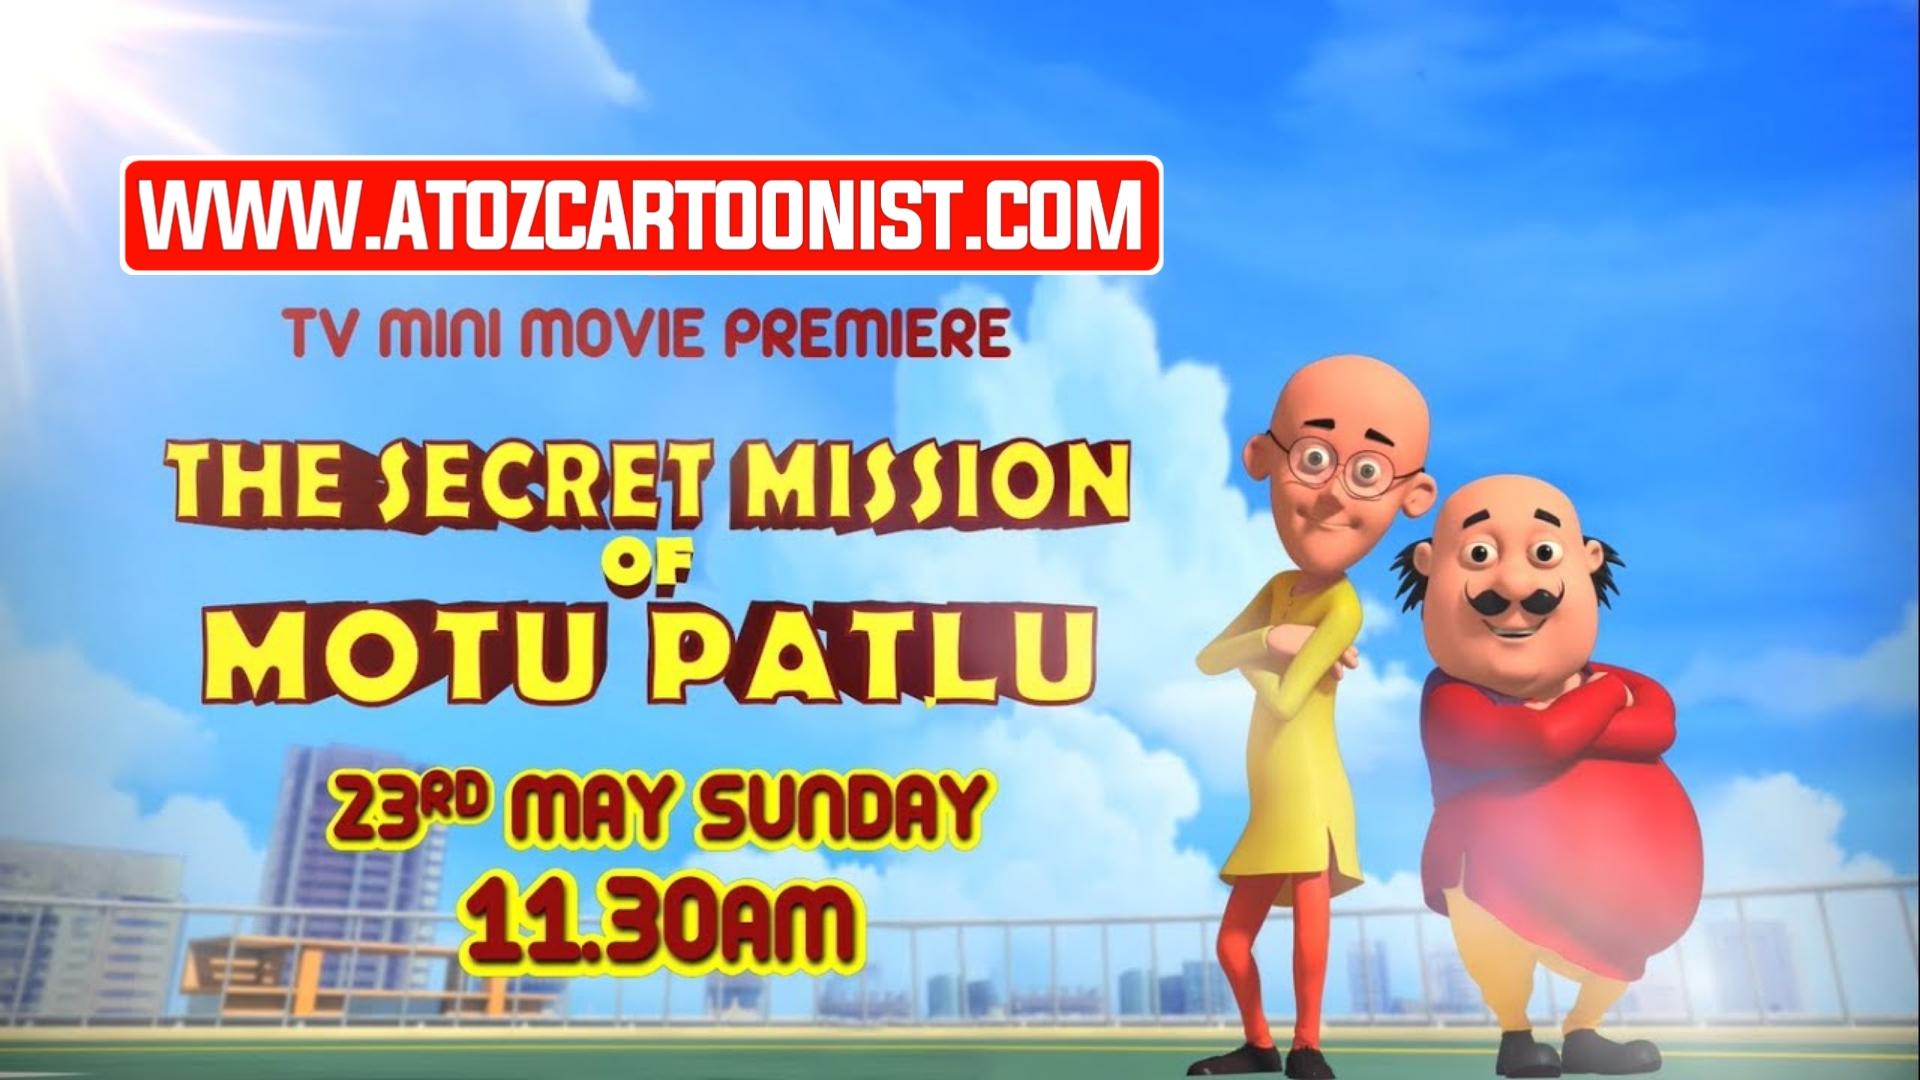 THE SECRET MISSION OF MOTU PATLU FULL MOVIE IN HINDI DOWNLOAD (480P & 720P)